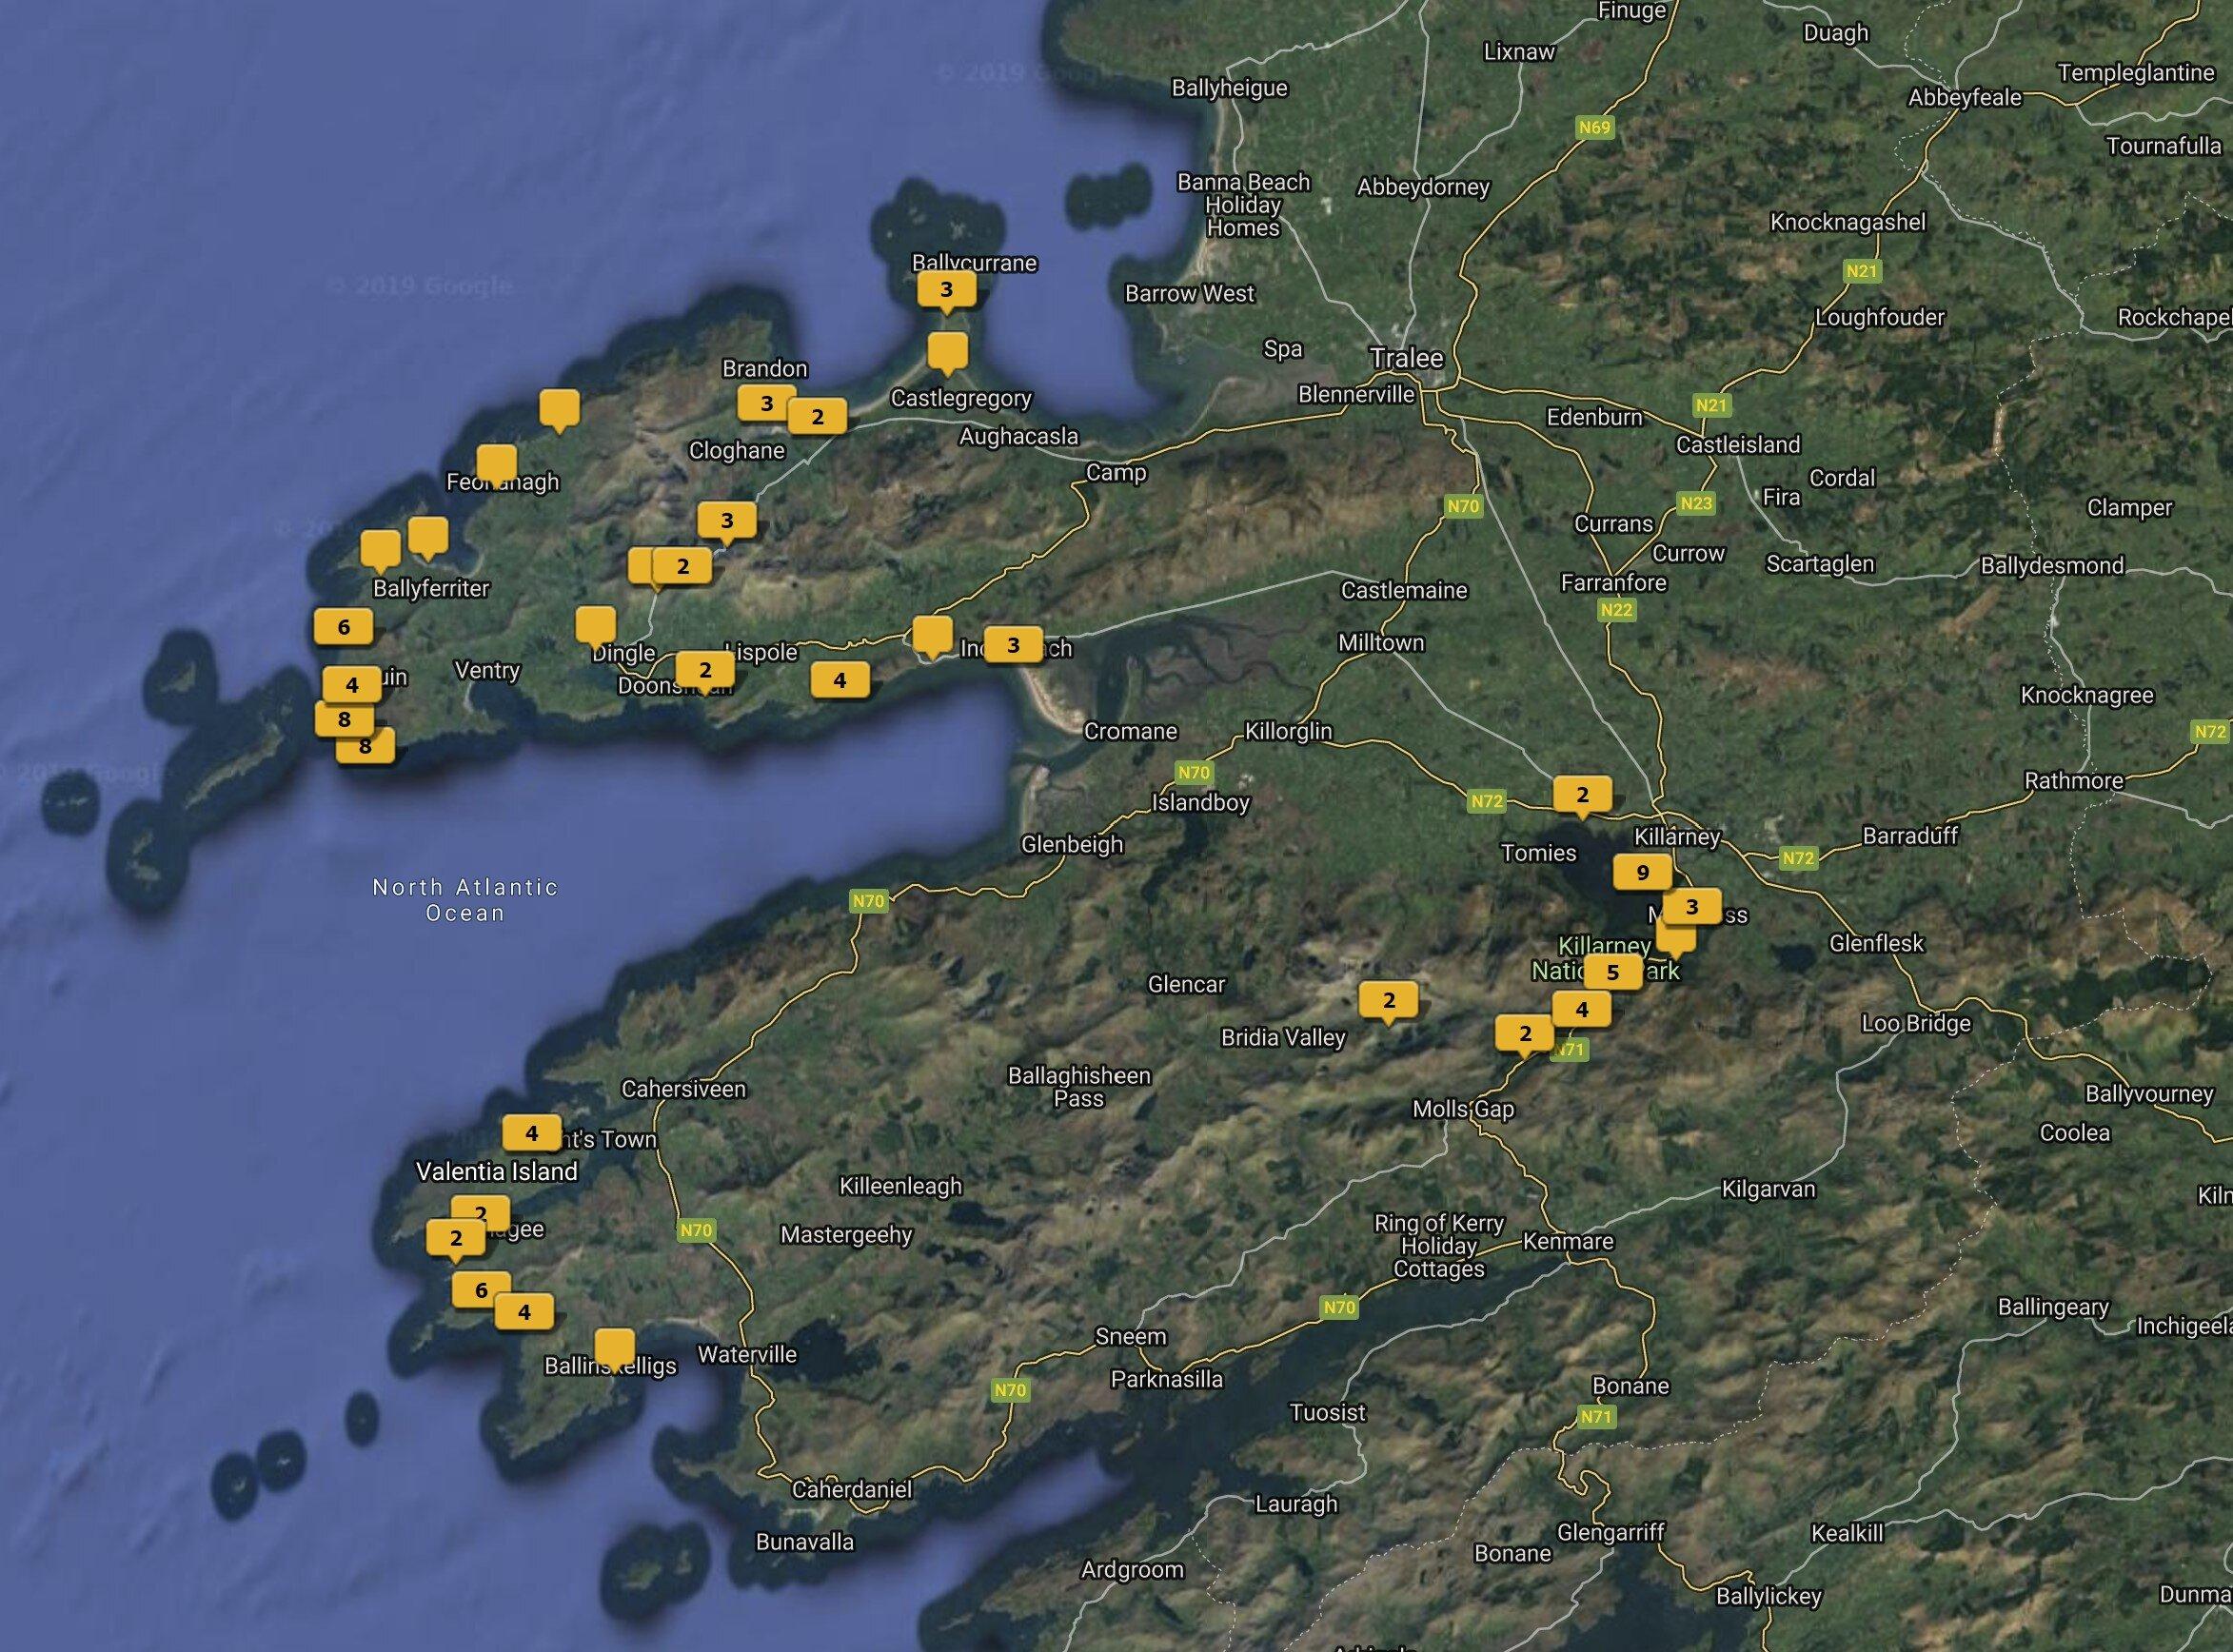 Dingle-Killarney-South Kerry Photo Map.jpg